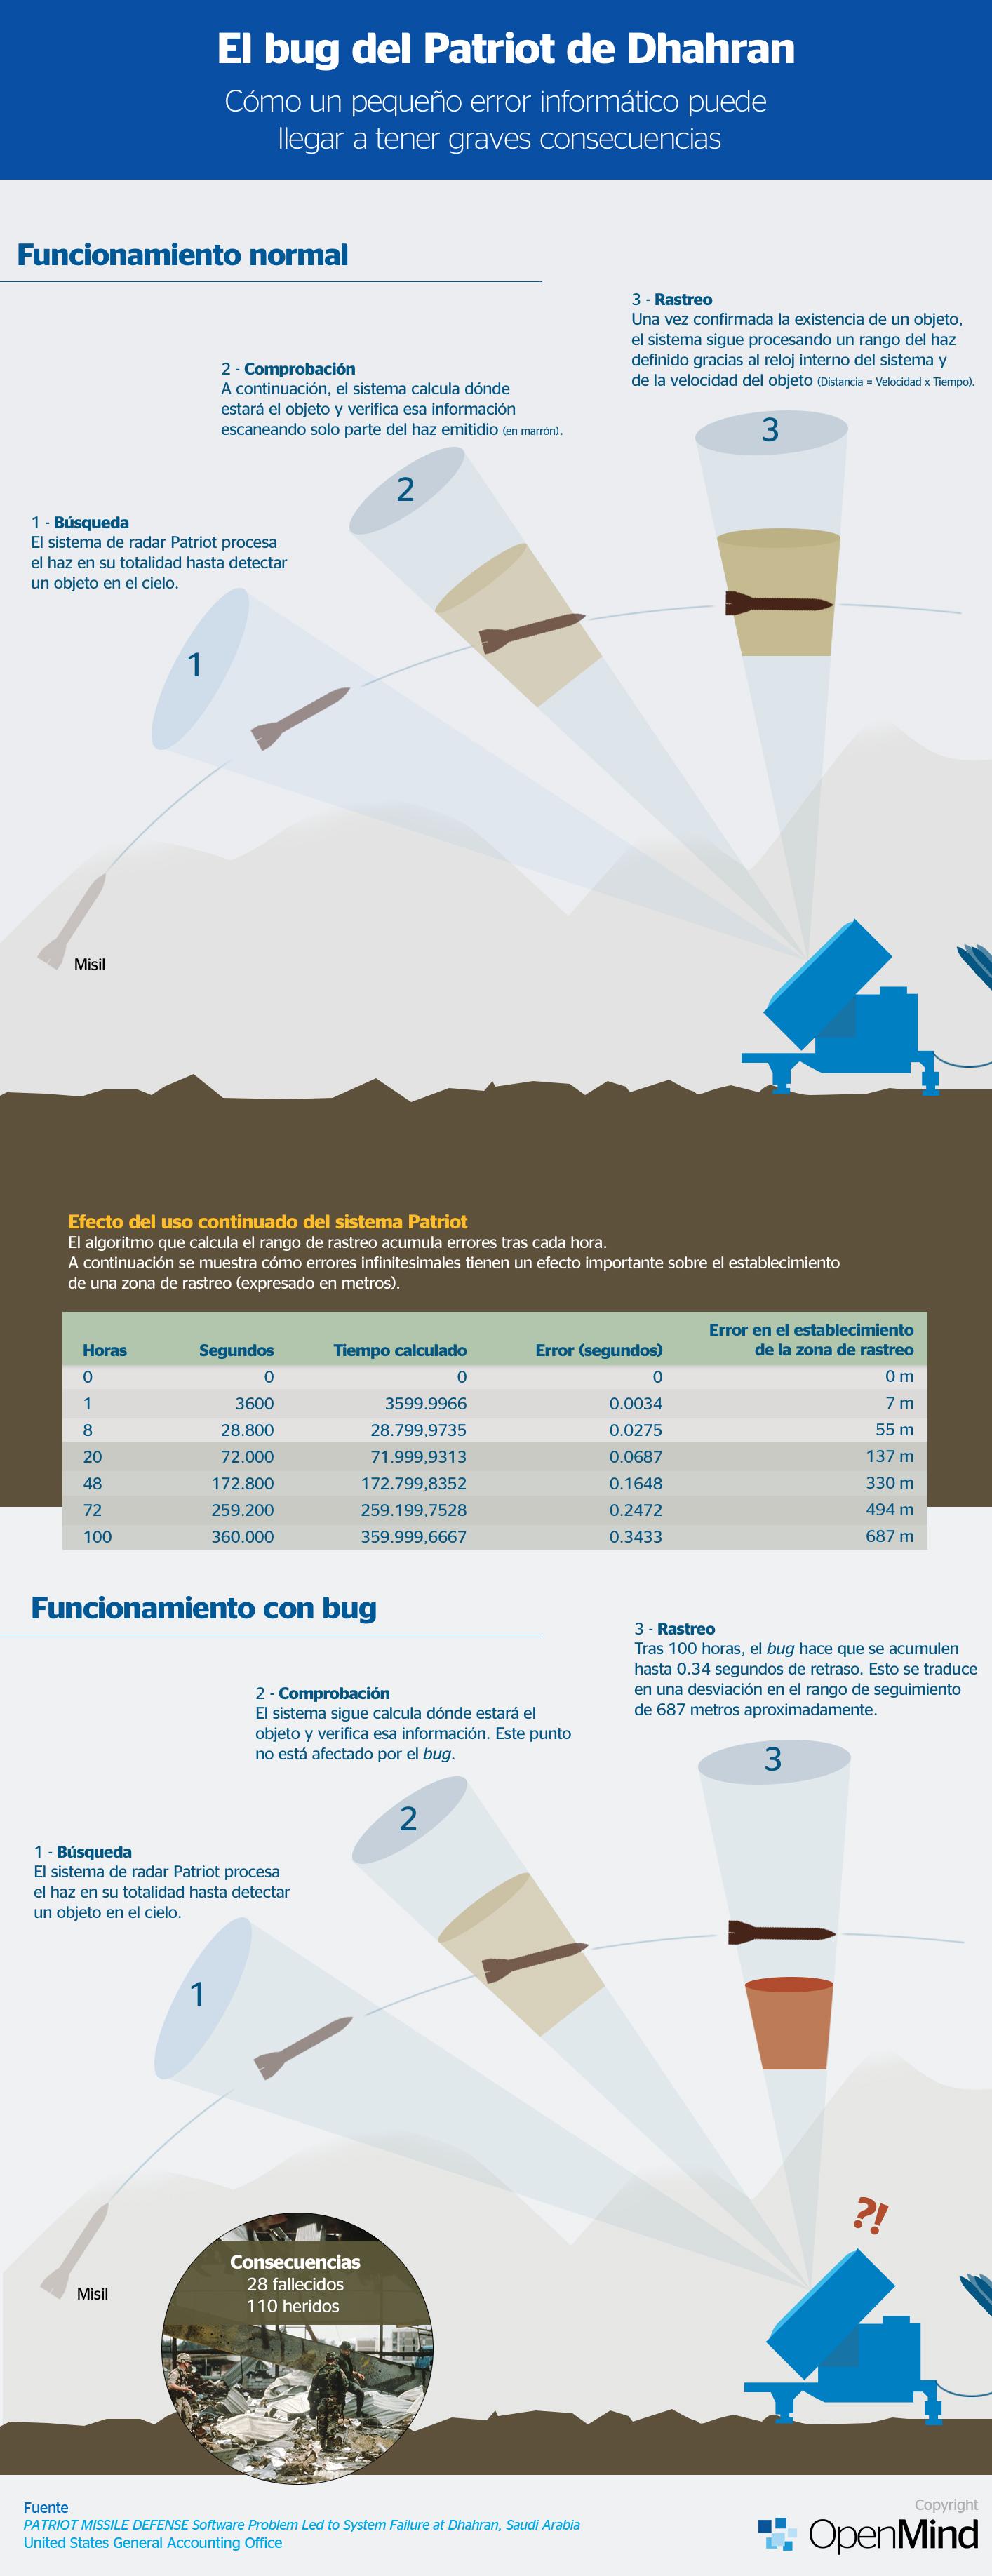 BBVA-OpenMind-patriot-infografía-esp